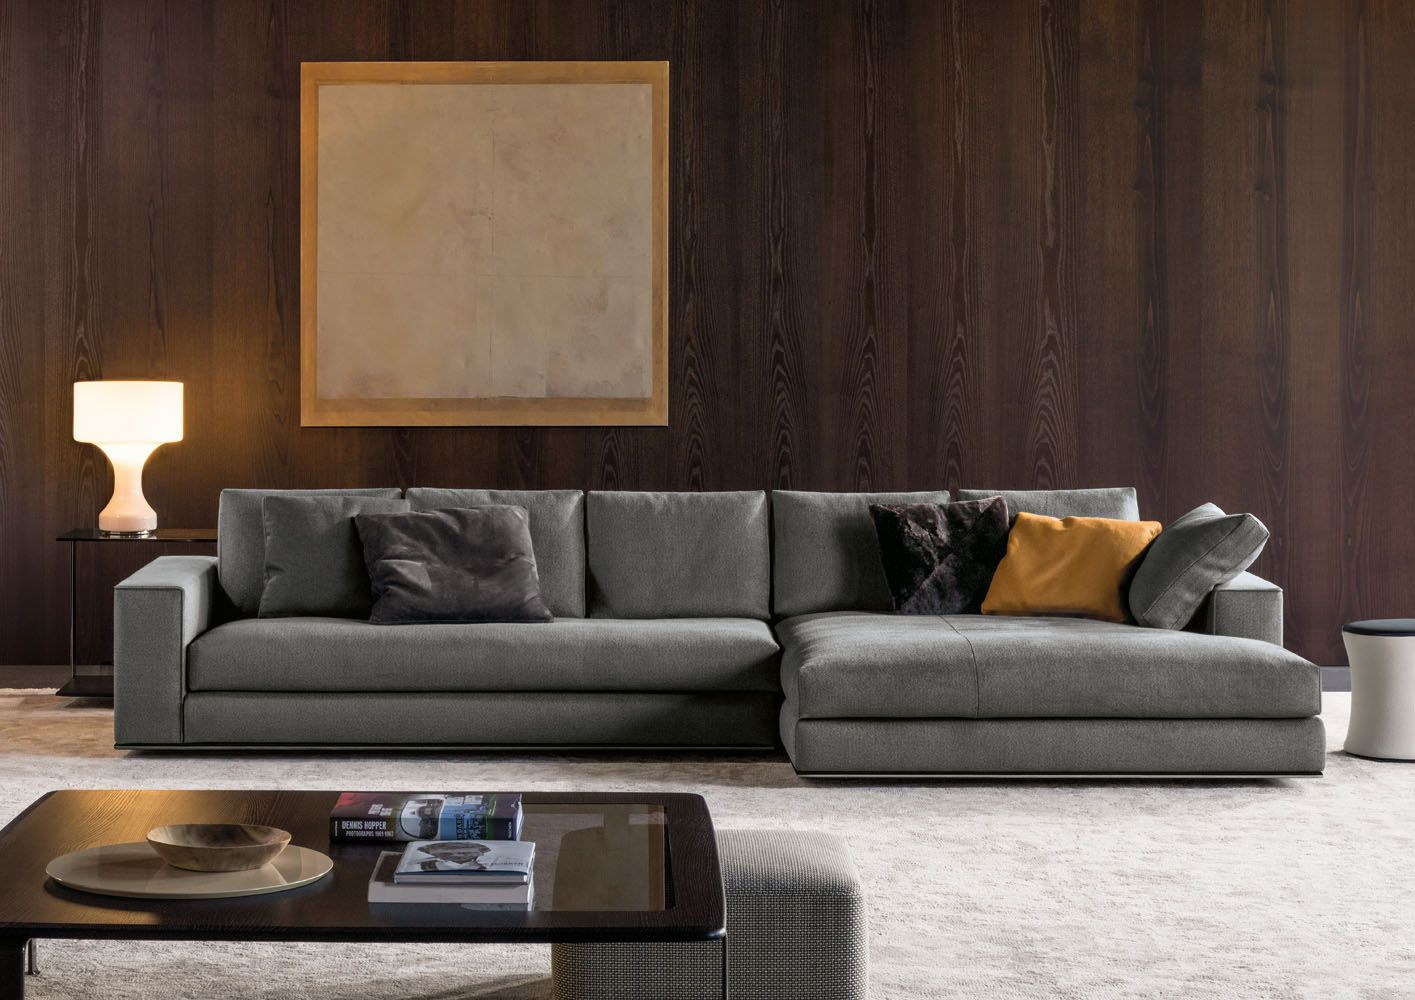 Poltrona Frau Leather PostModern Italian Sofa Leather